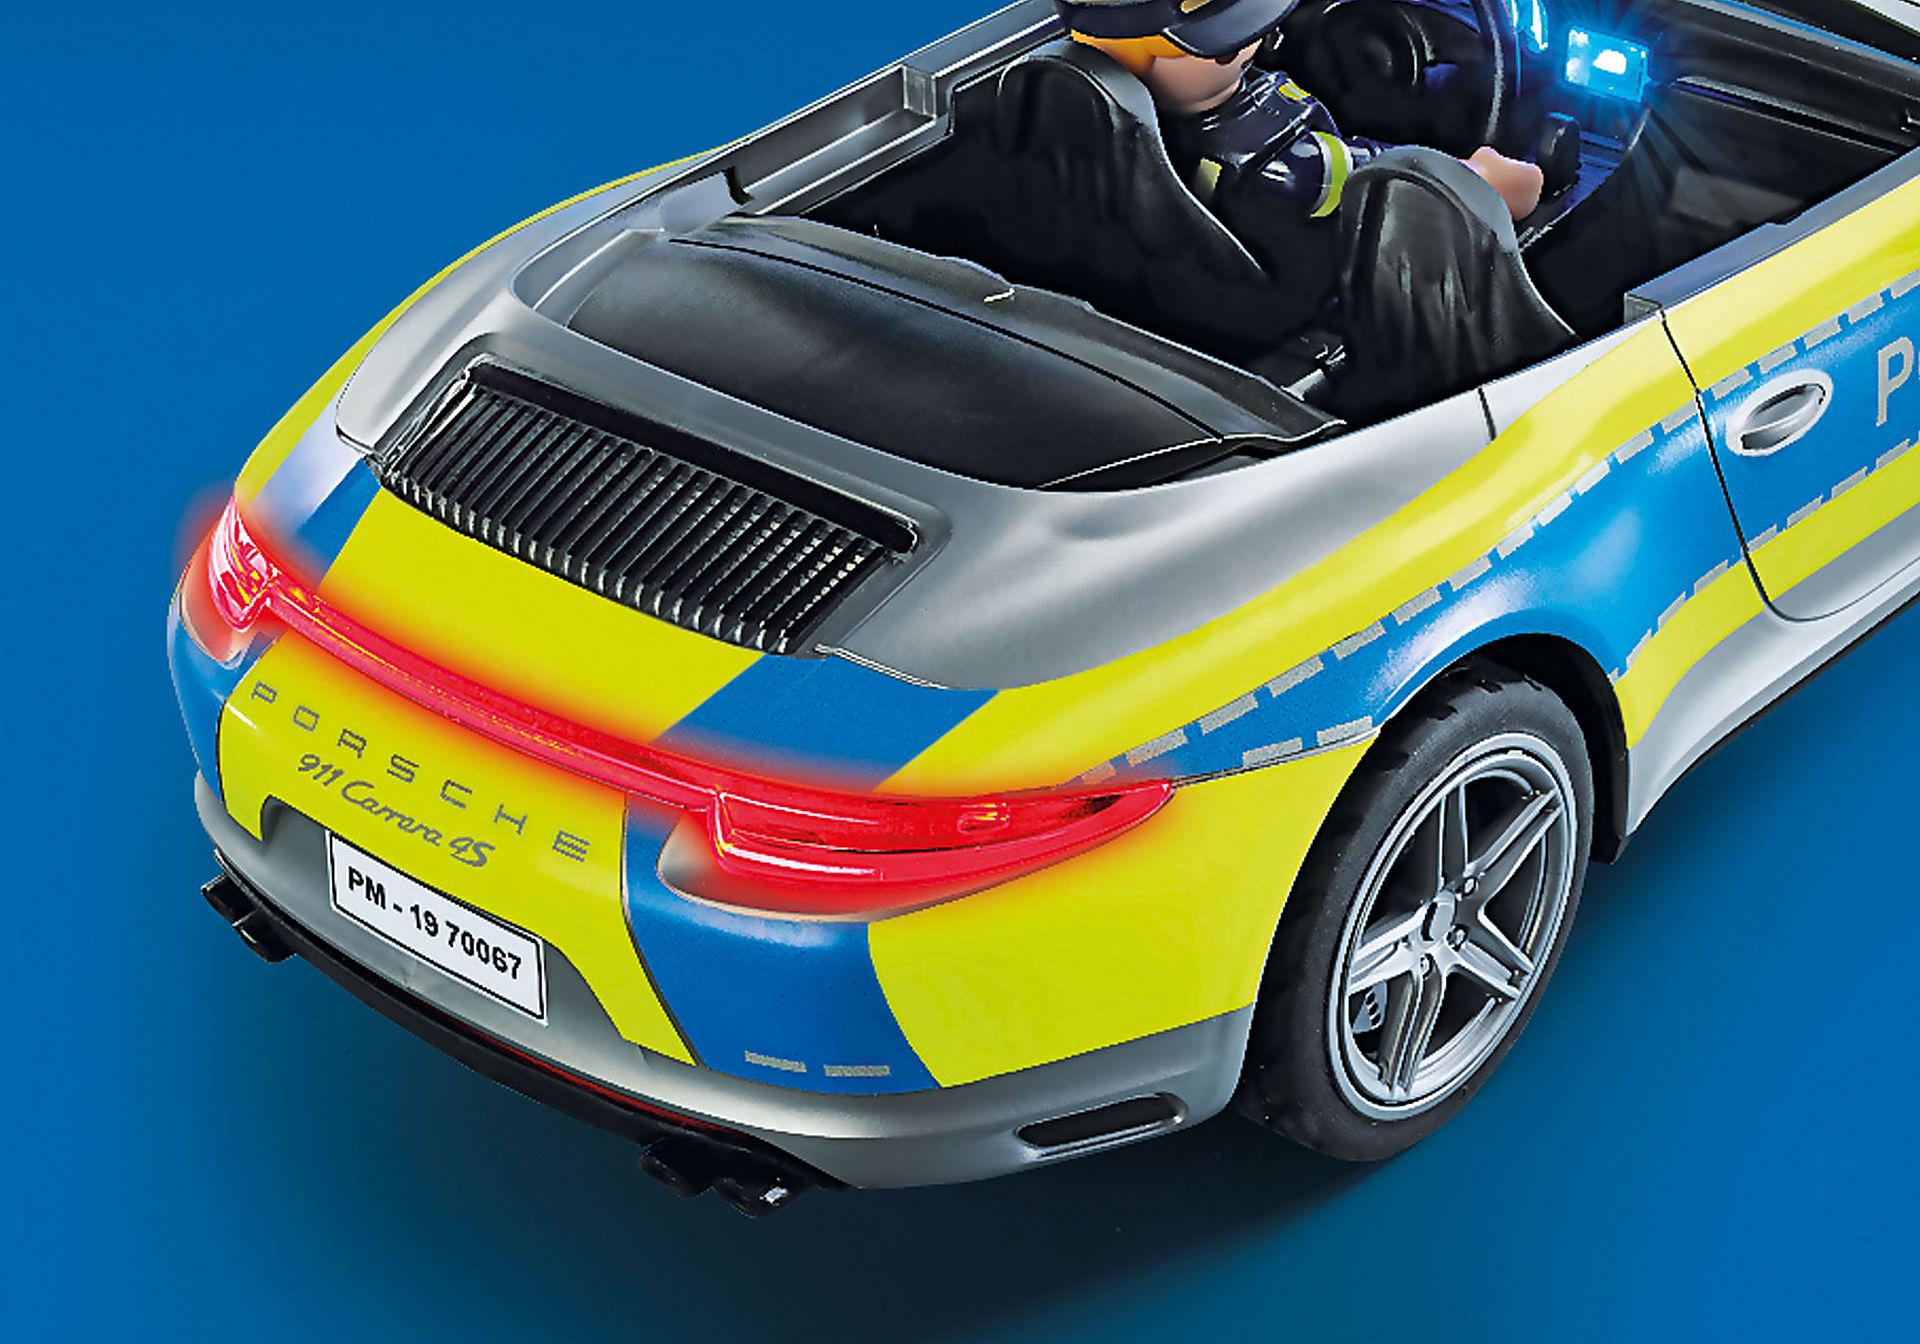 70067 Porsche 911 Carrera 4S Polizei zoom image7